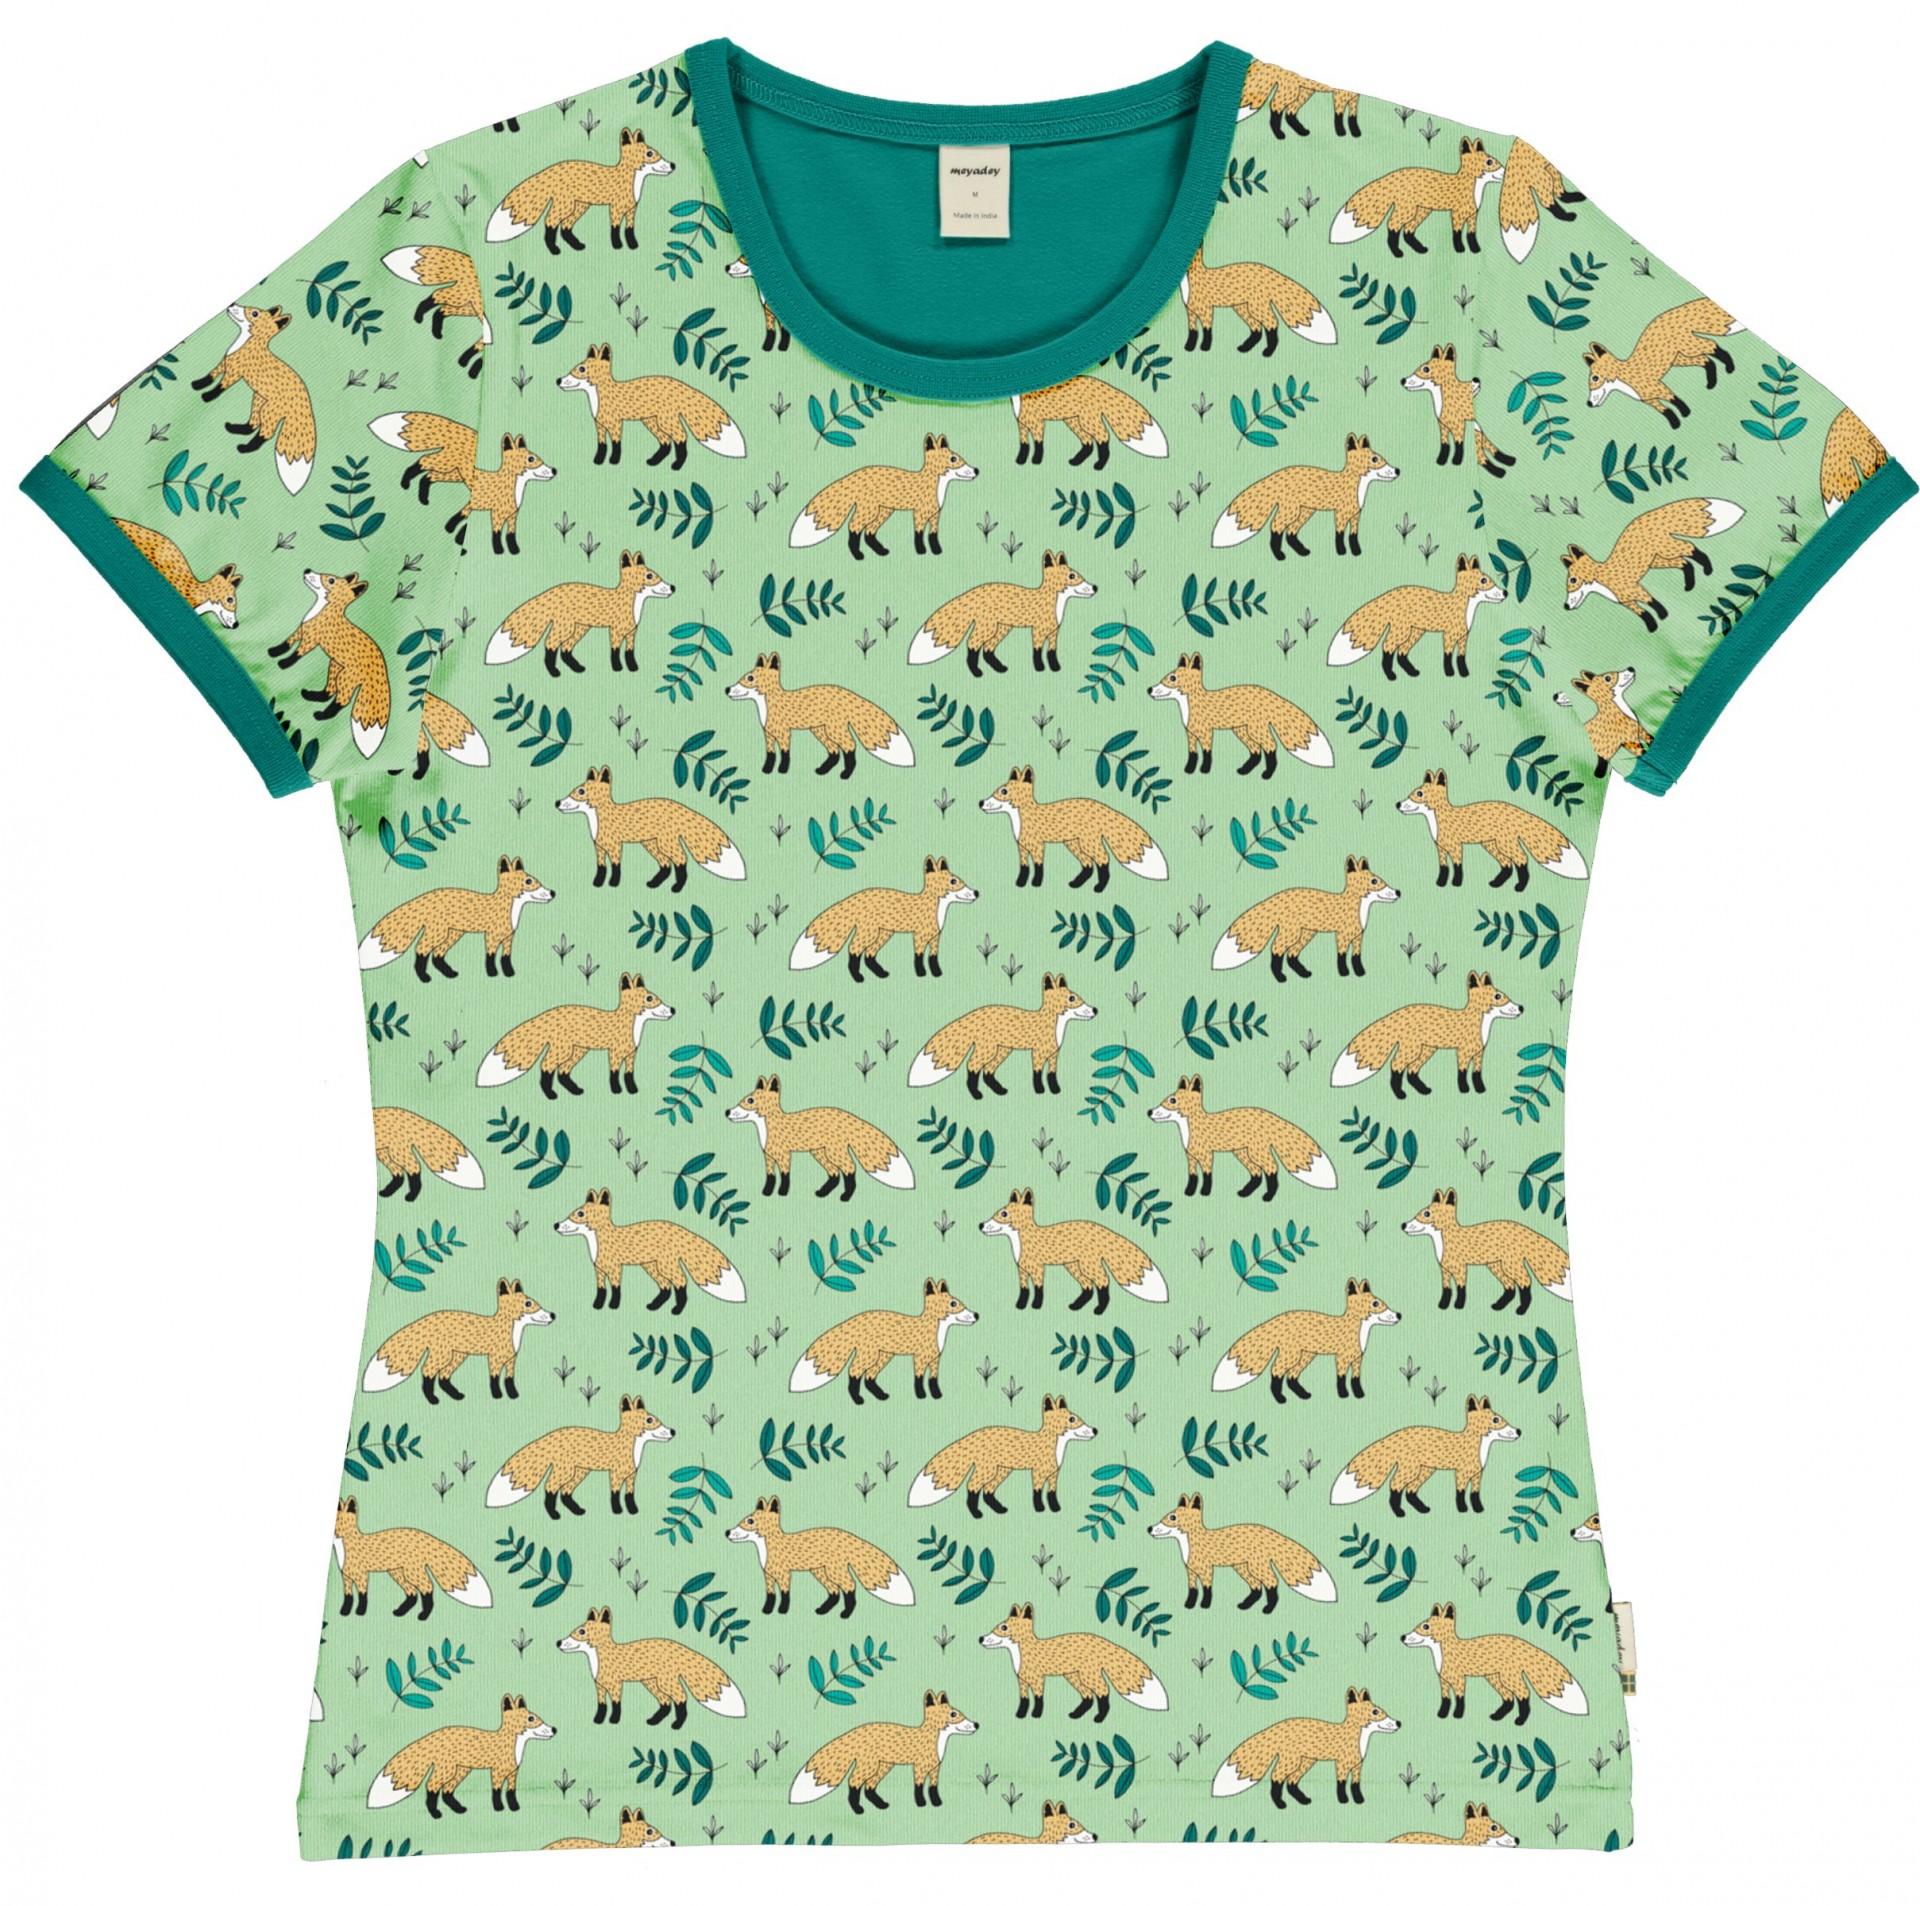 T-shirt de adulto (mulher) Wild Fox Meyaday (Tamanhos disponíveis M)